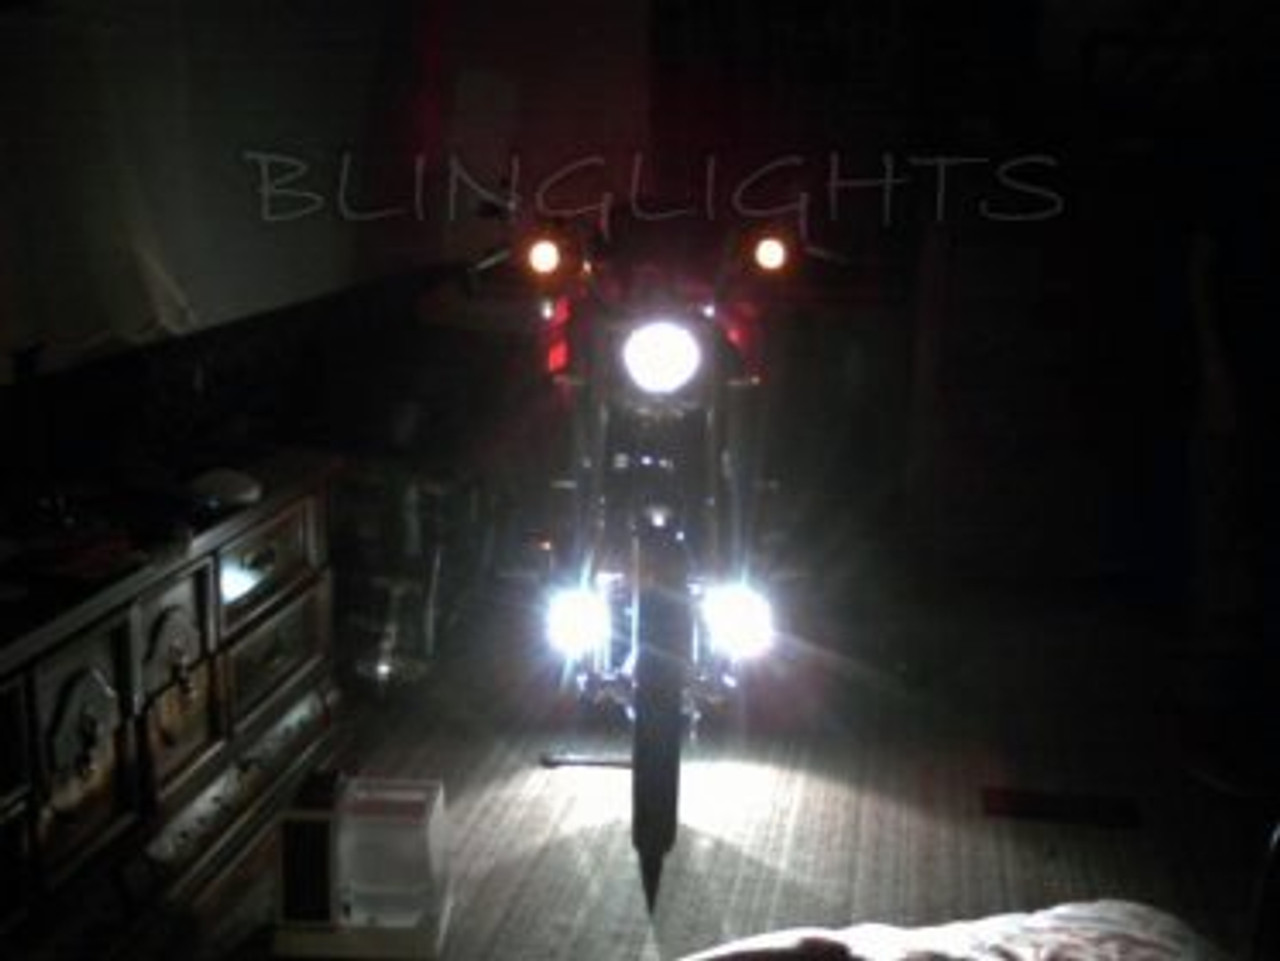 1995 1996 1997 Harley-Davidson FXSTSB Bad Boy Softail Xenon Driving Lights Fog Lamps Foglamps Kit